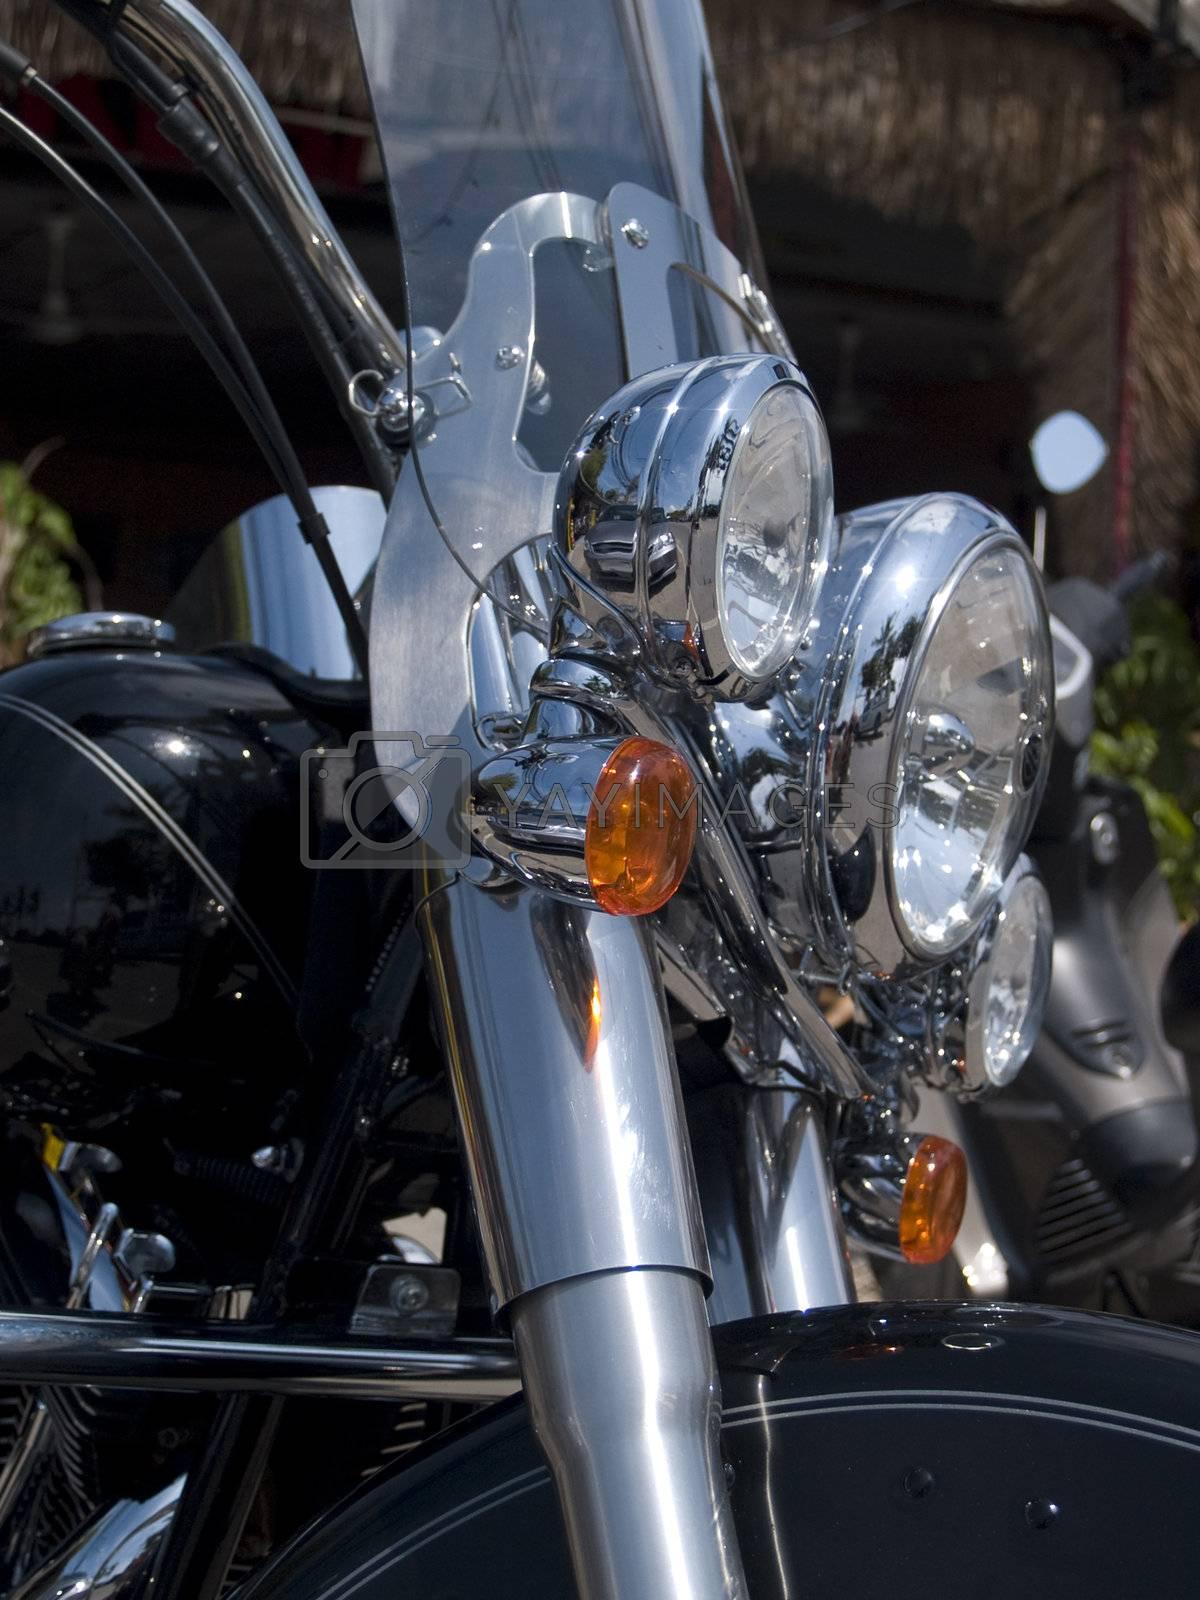 Detail of bike motorcycle by epixx